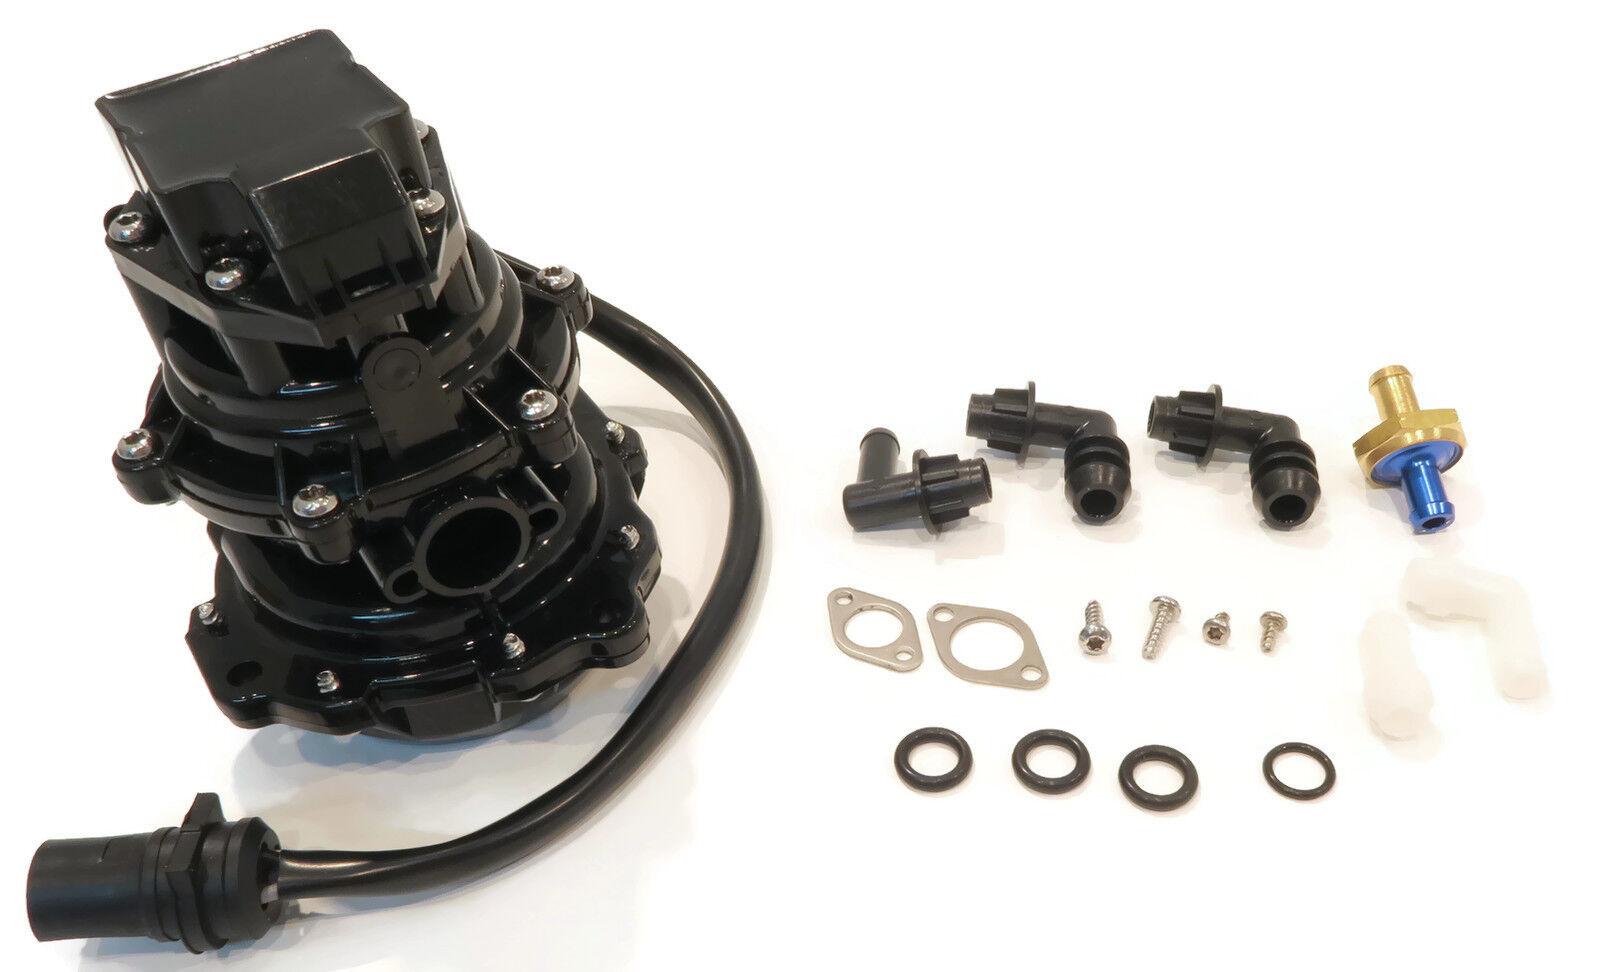 Fuel Pump for 1993 Evinrude VE225PXETF, VE225PZETA, E200CXETD, E200CXATS Engines